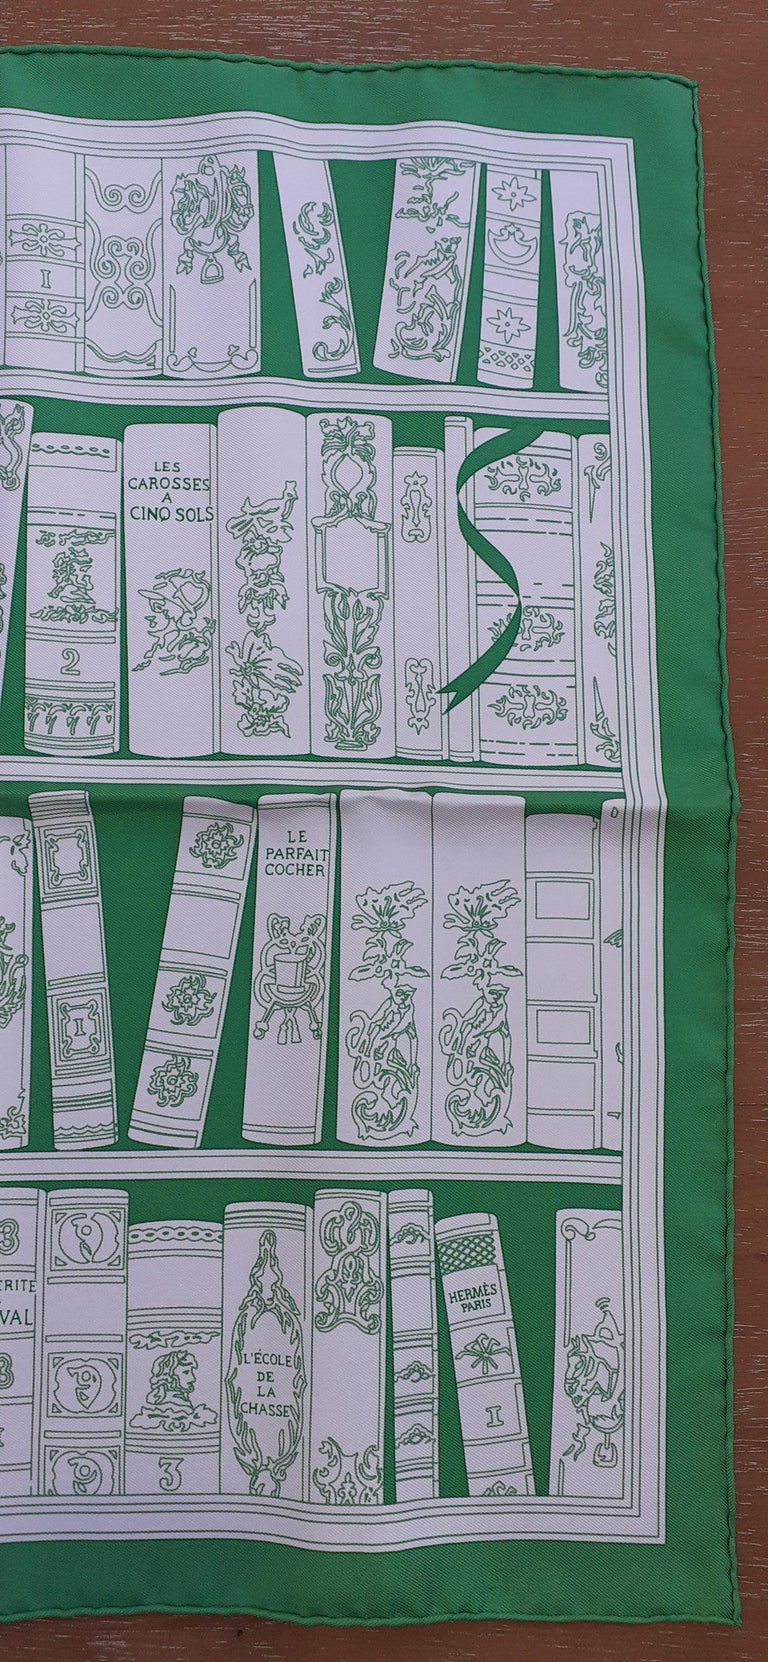 Gray Hermès Small Silk Scarf Gavroche Bibliothèque Books White Green 42 cm